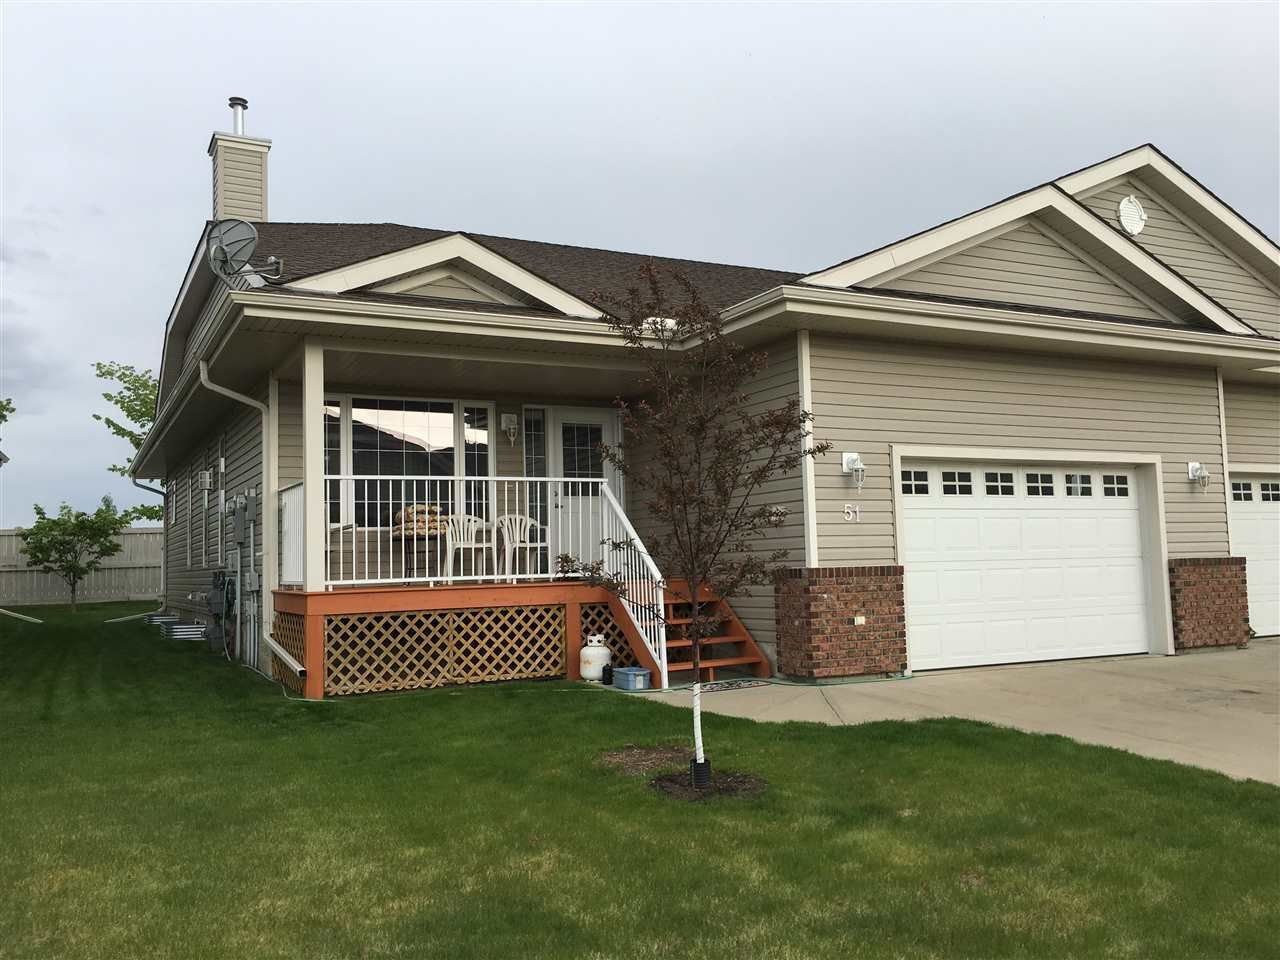 Main Photo: 51 8602 SOUTHFORT Drive: Fort Saskatchewan Townhouse for sale : MLS®# E4160403